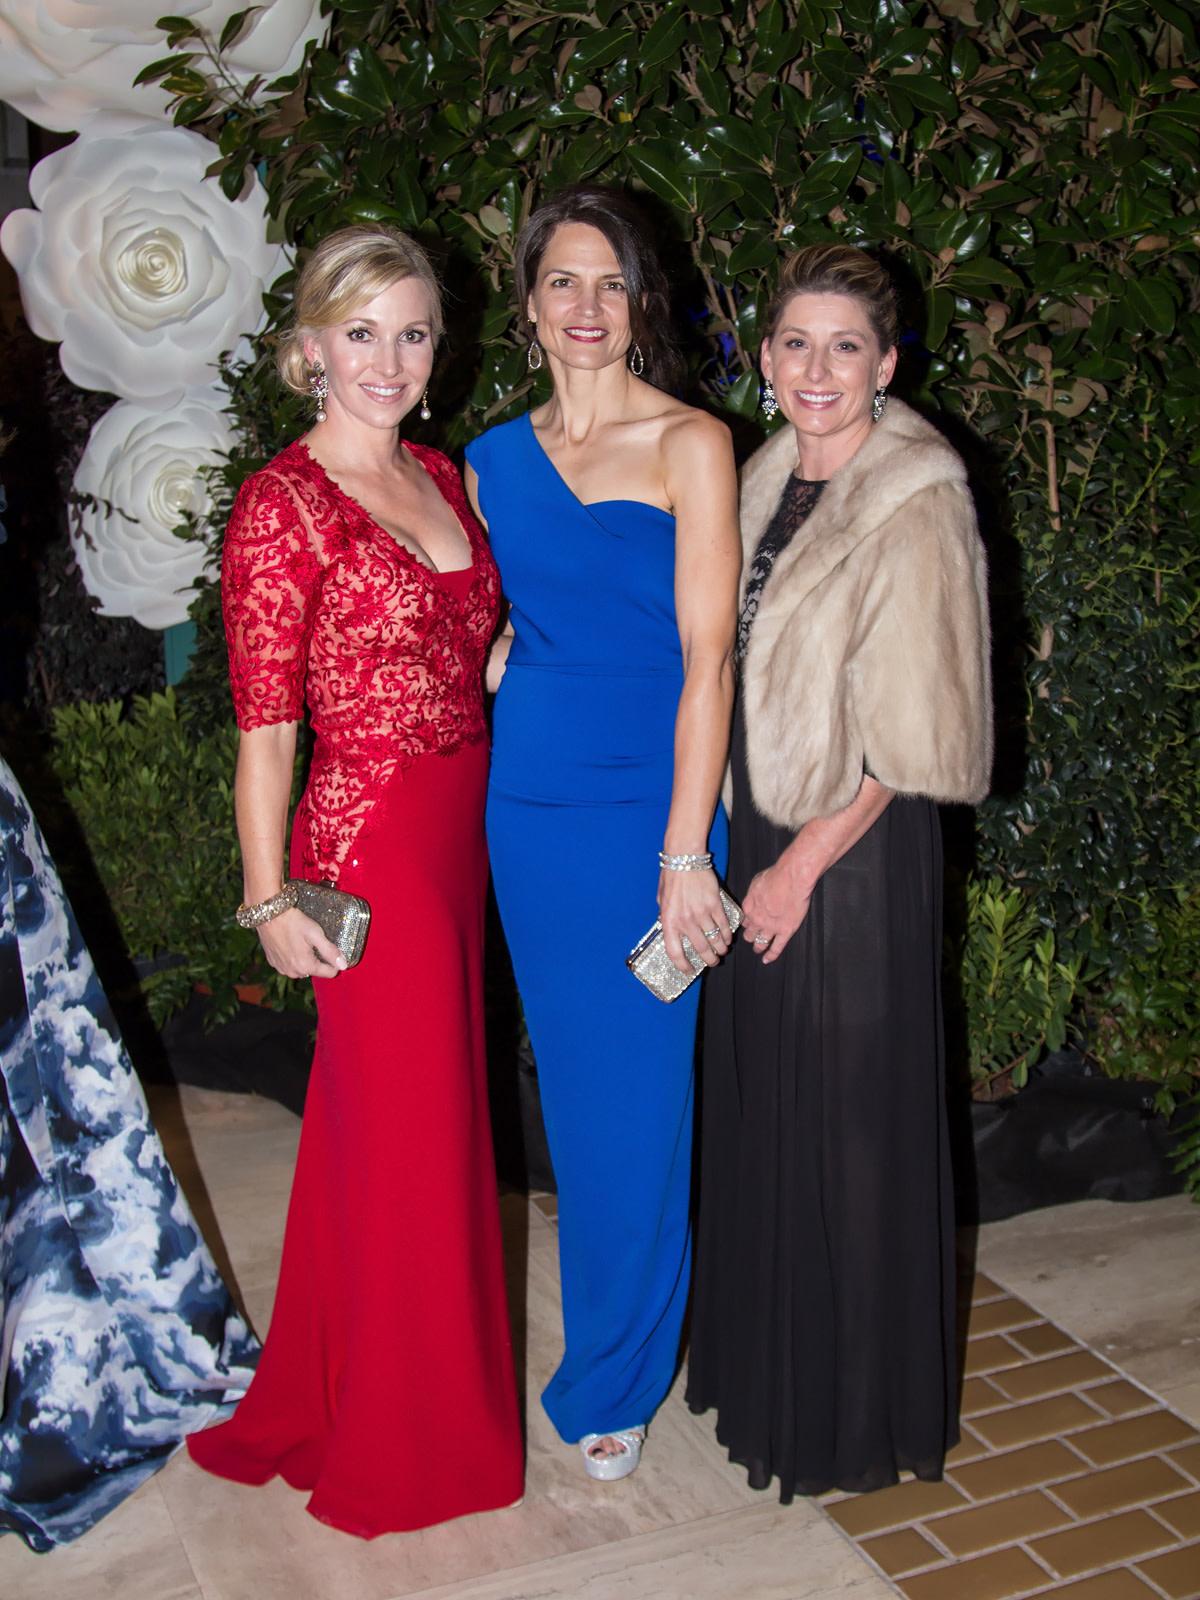 Tavia Hunt in Reem Acra, Meredith Messick, Cammie Heflin in Alice+Olivia